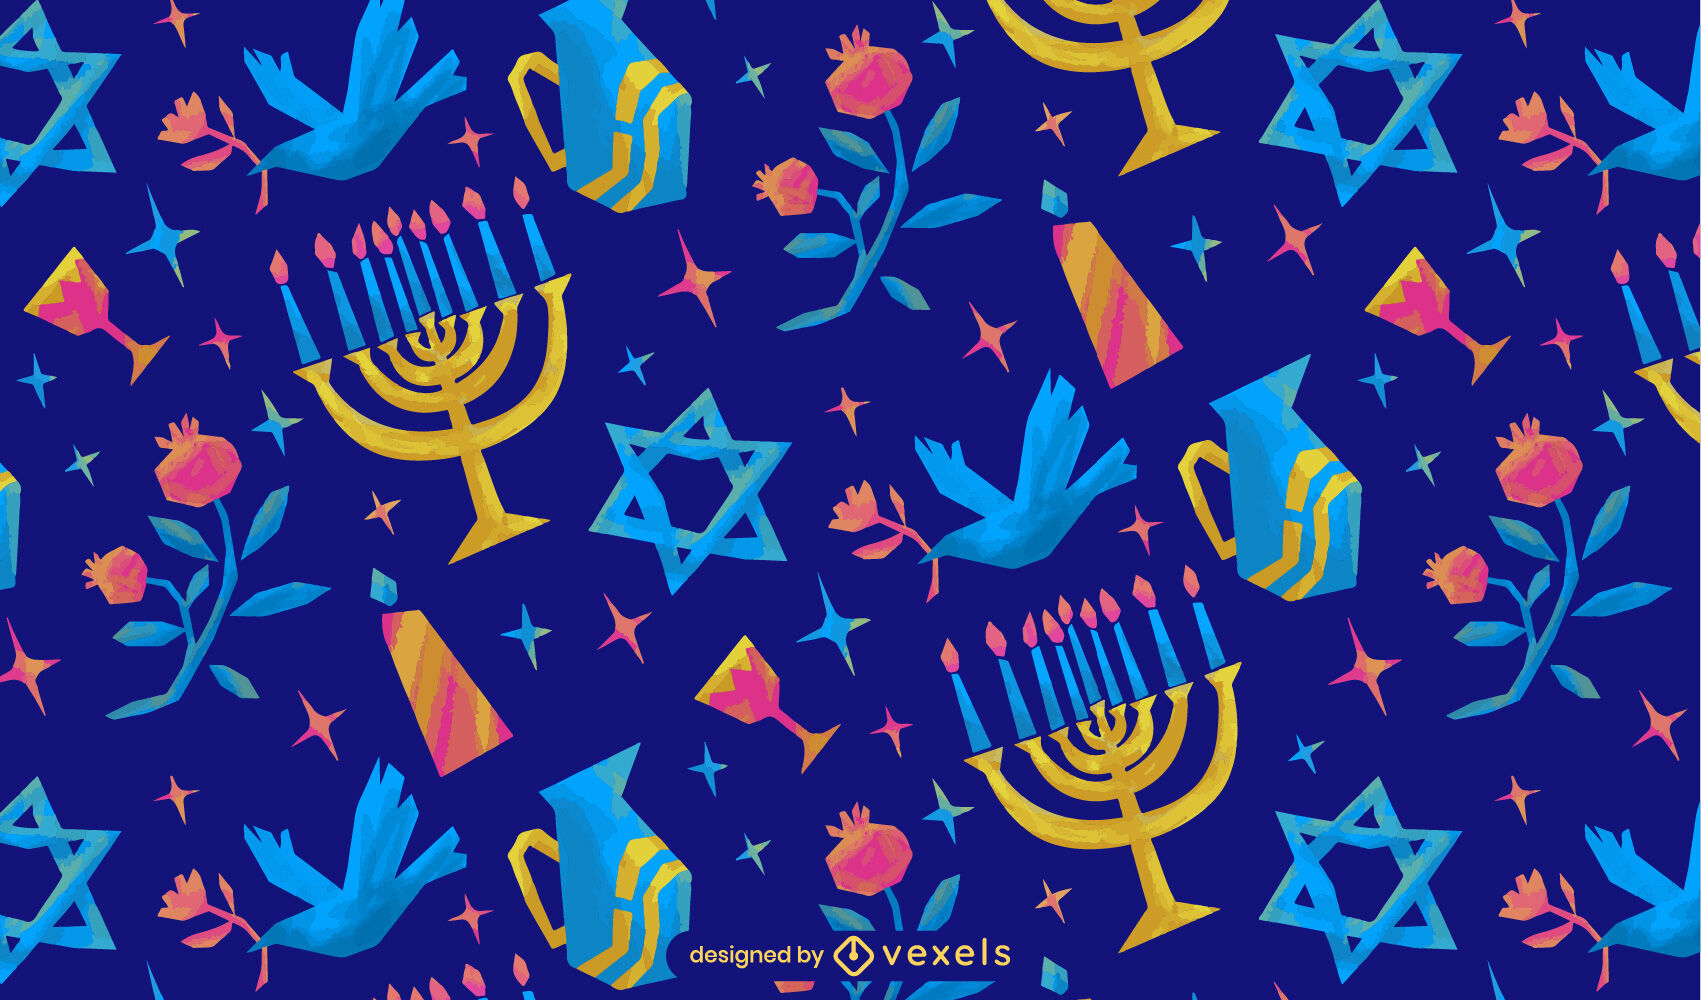 Elementos de Hanukkah seimi patrón plano